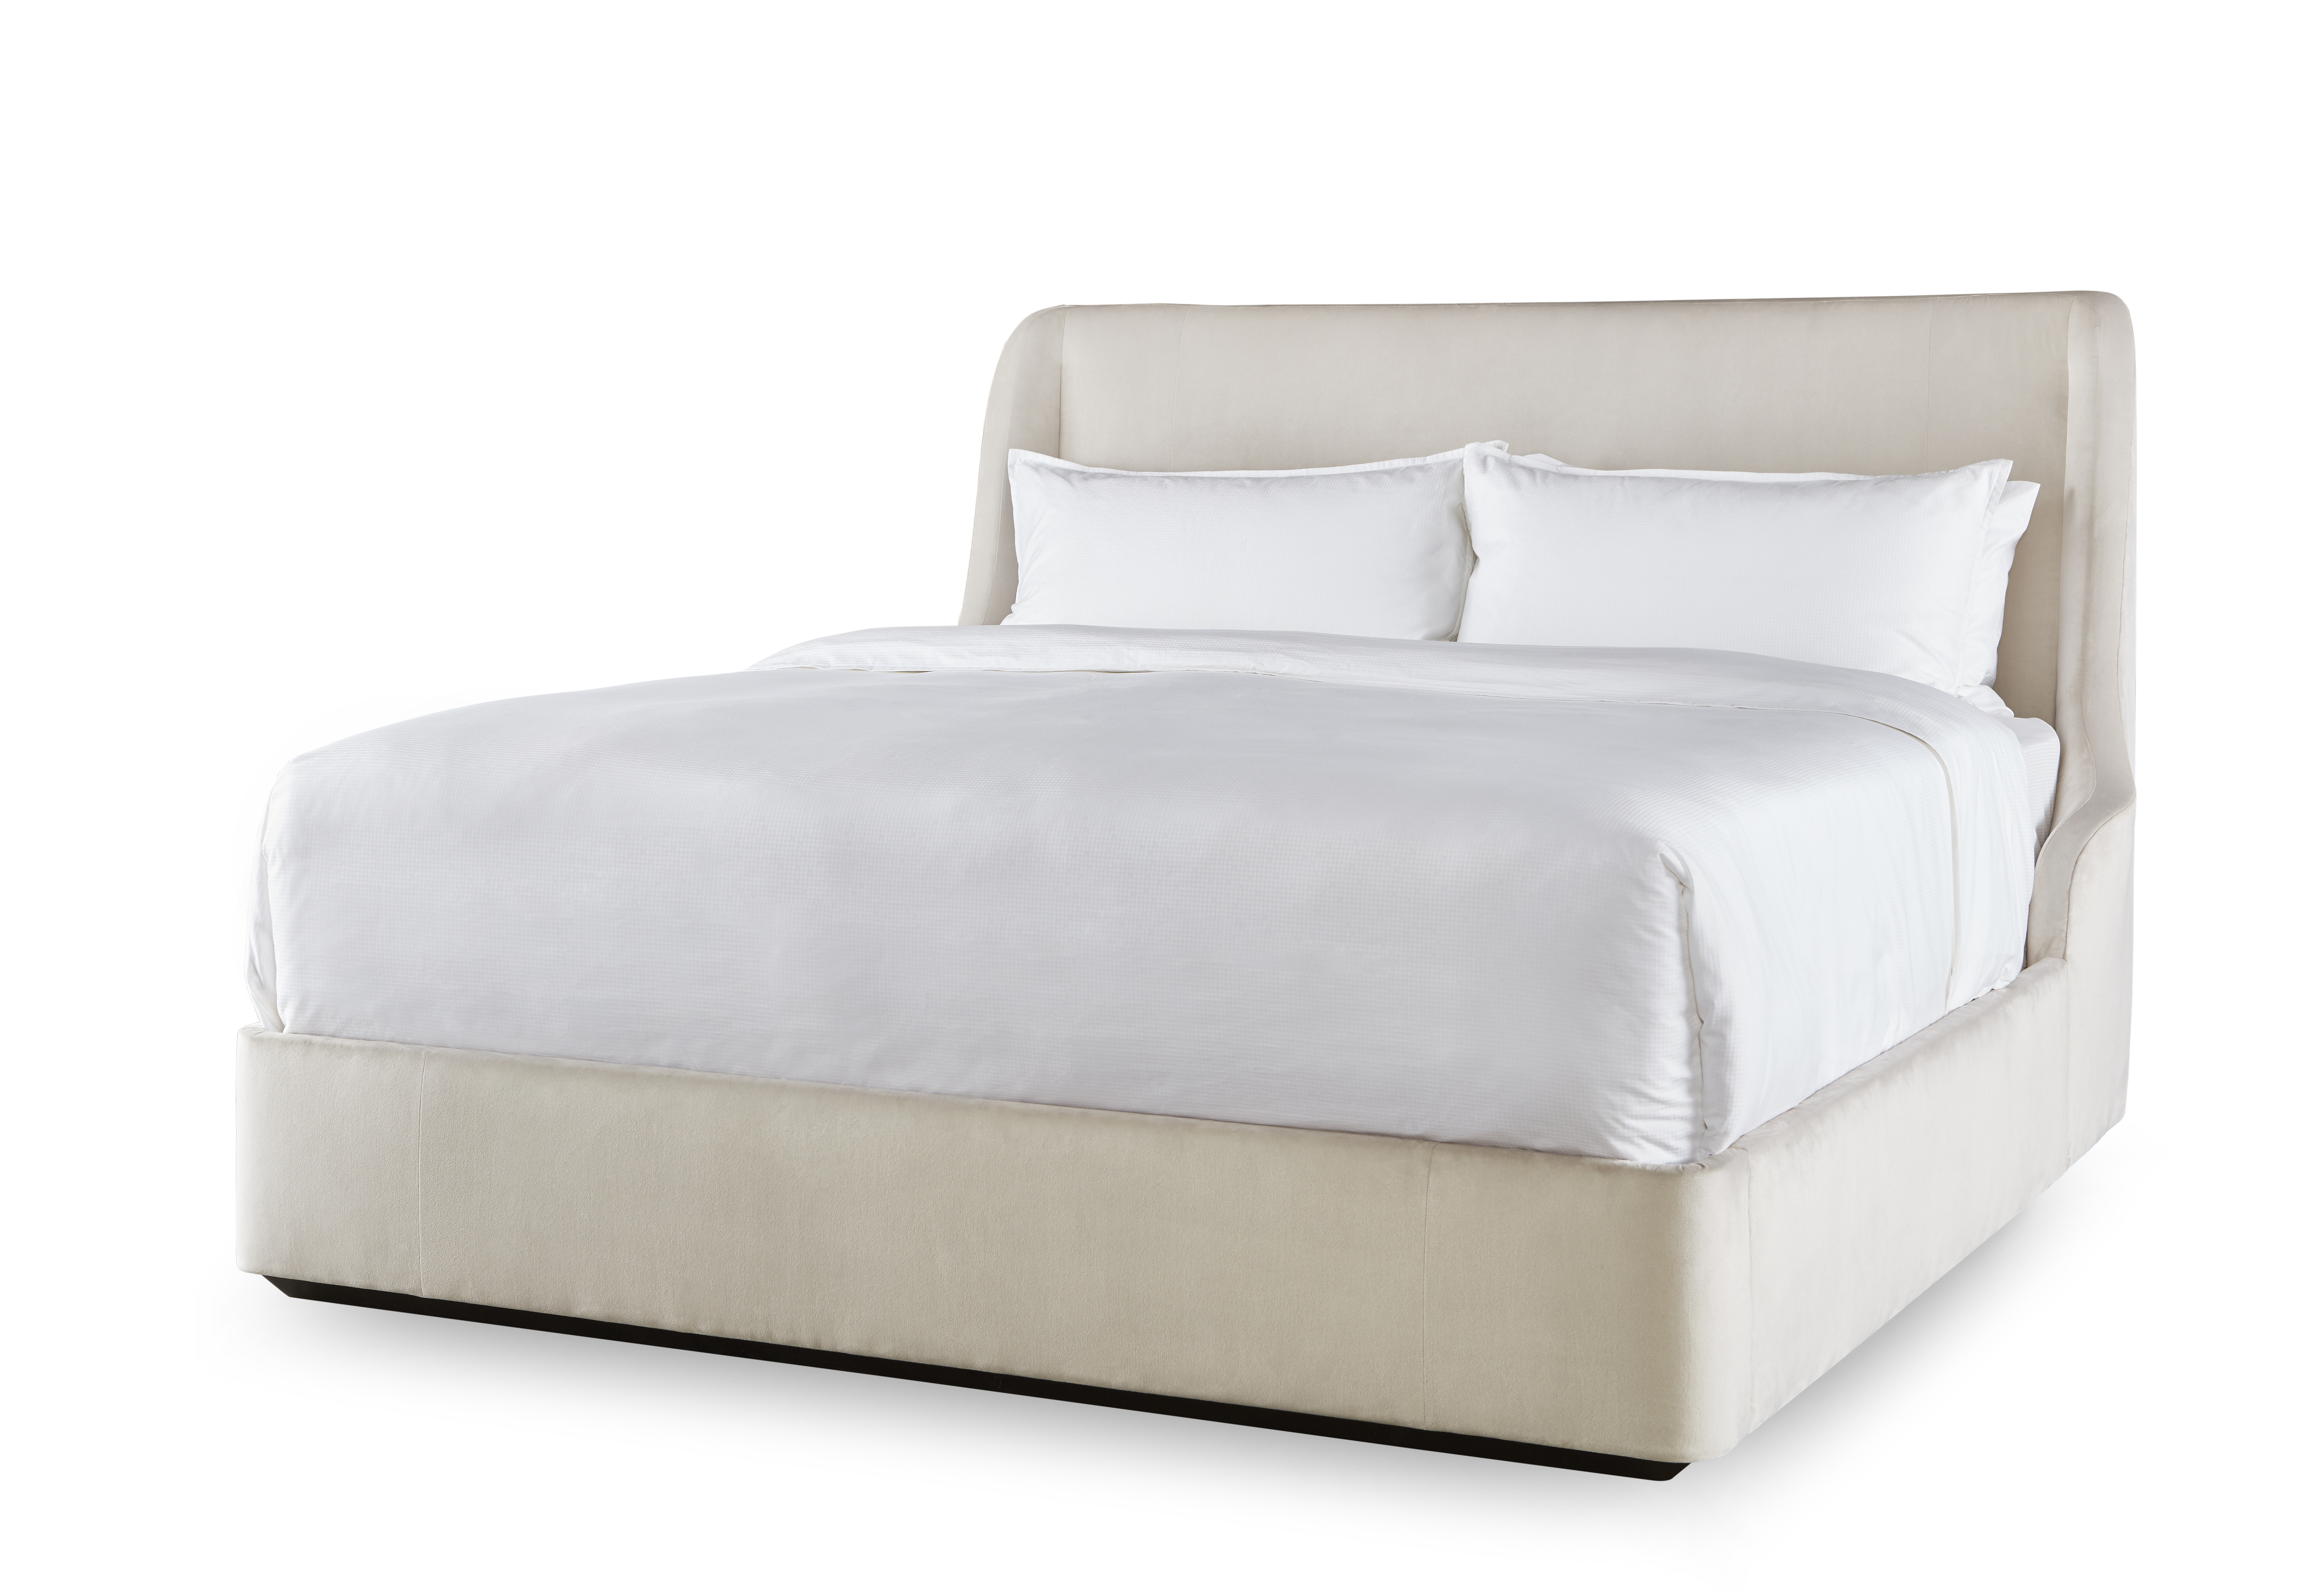 Baker_products_WNWN_casanova_bed_BAA3020_FRONT_3QRT-1